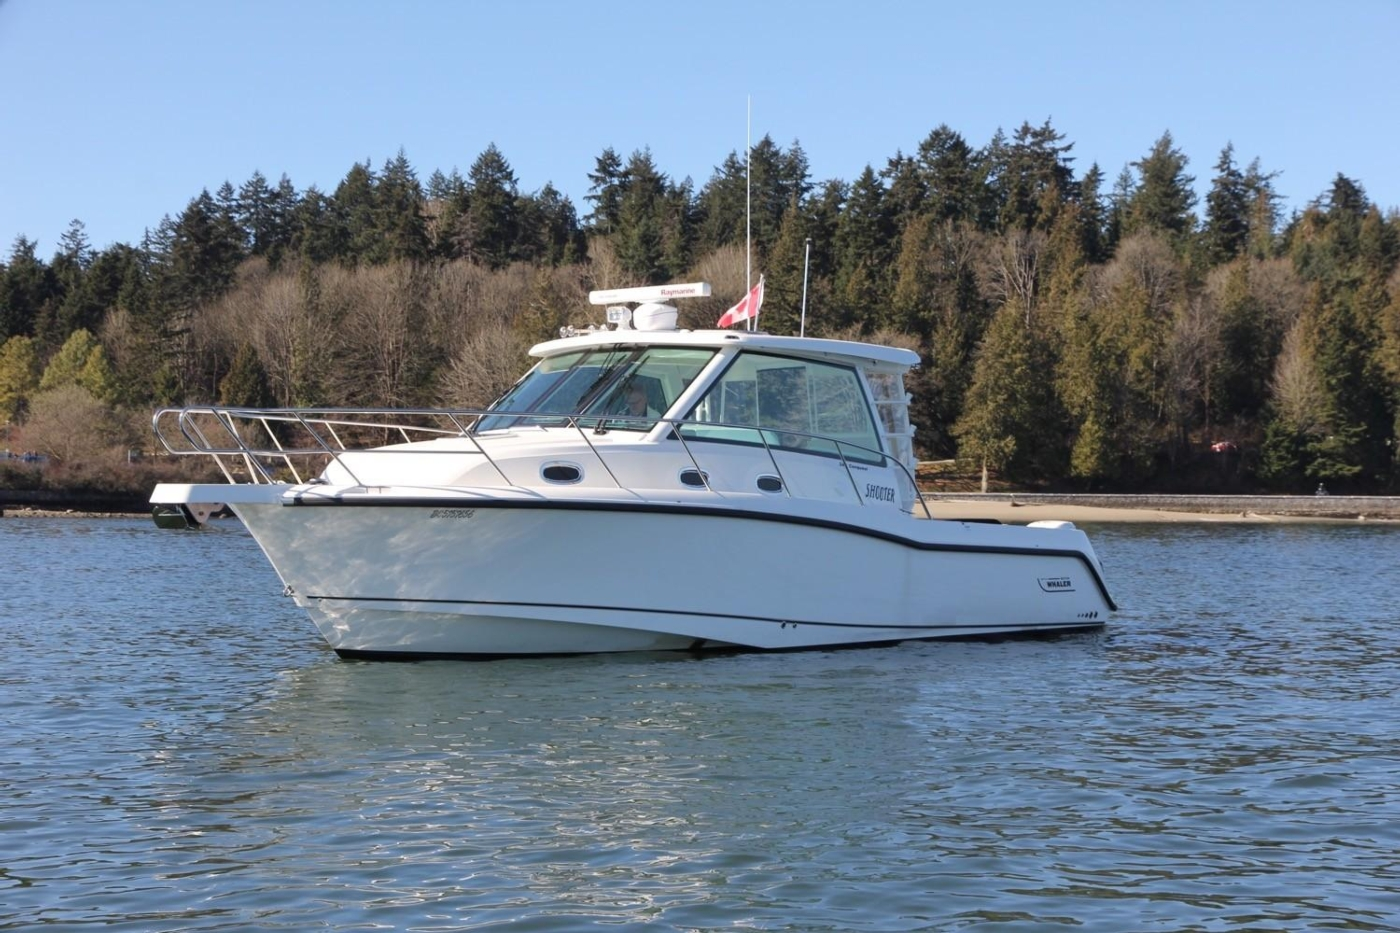 2017 Boston Whaler 345 Conquest, Port View